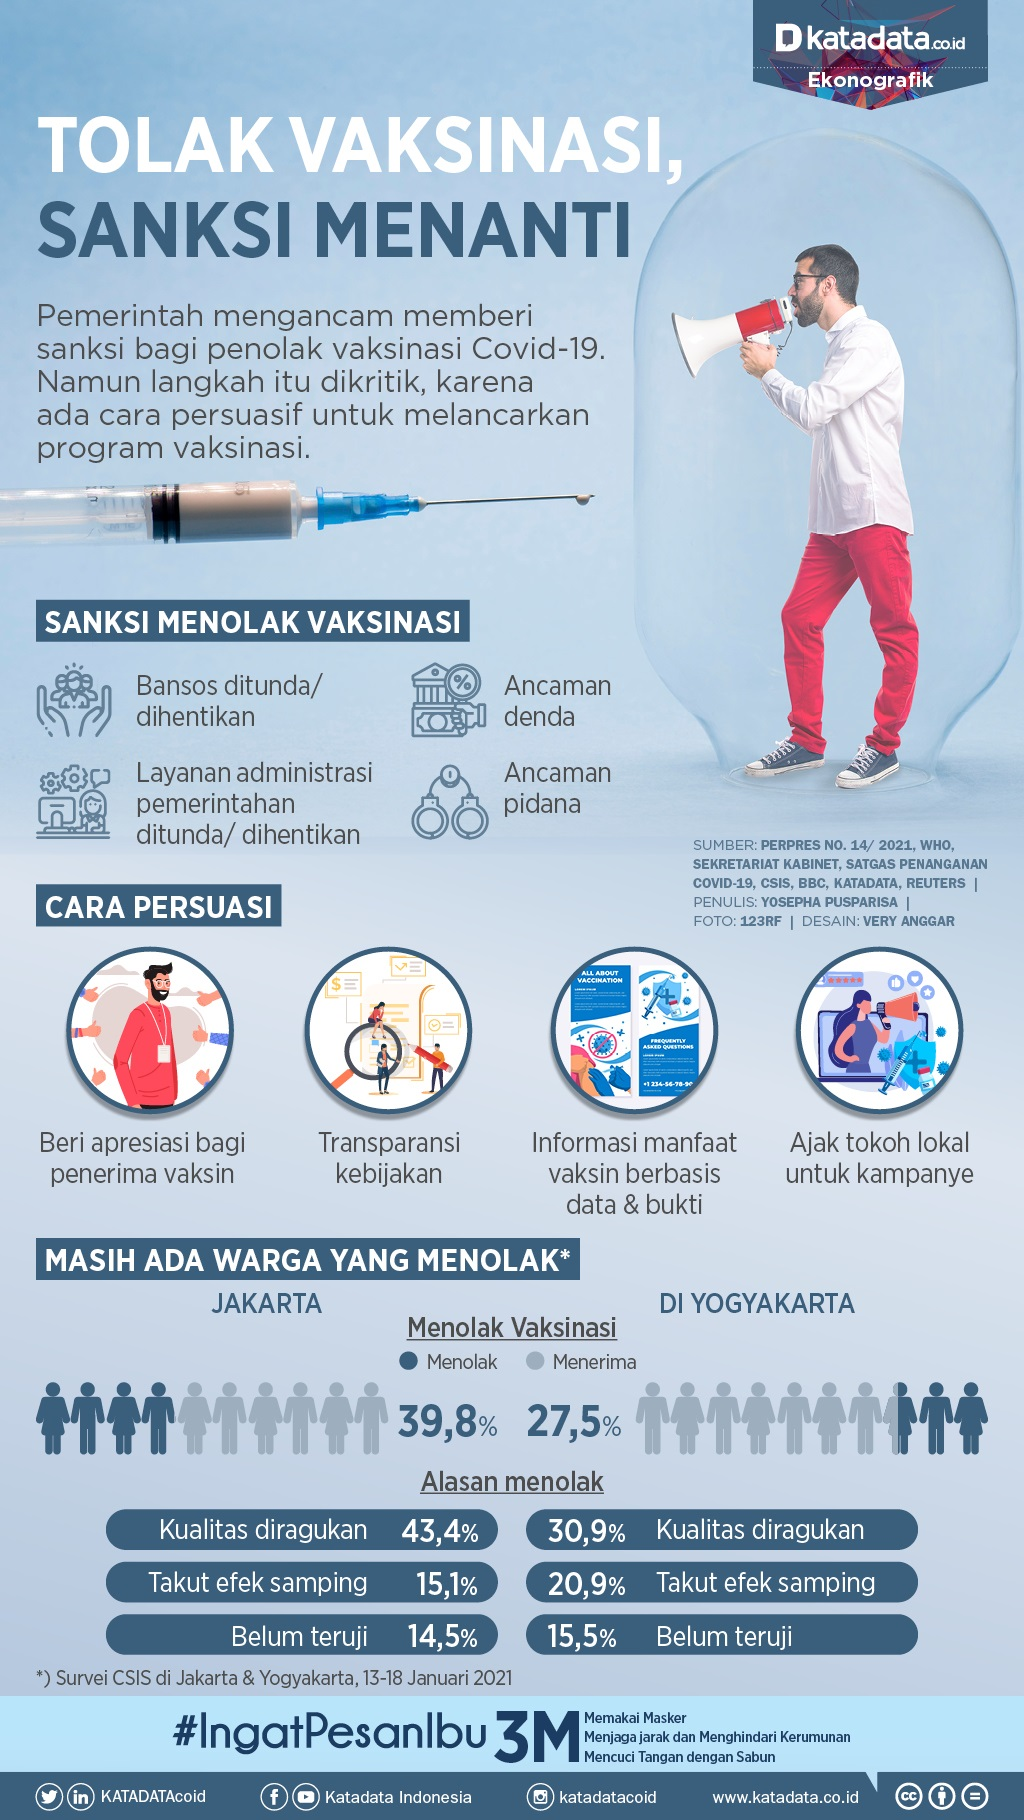 Infografik_Tolak vaksinasi, sanksi menanti